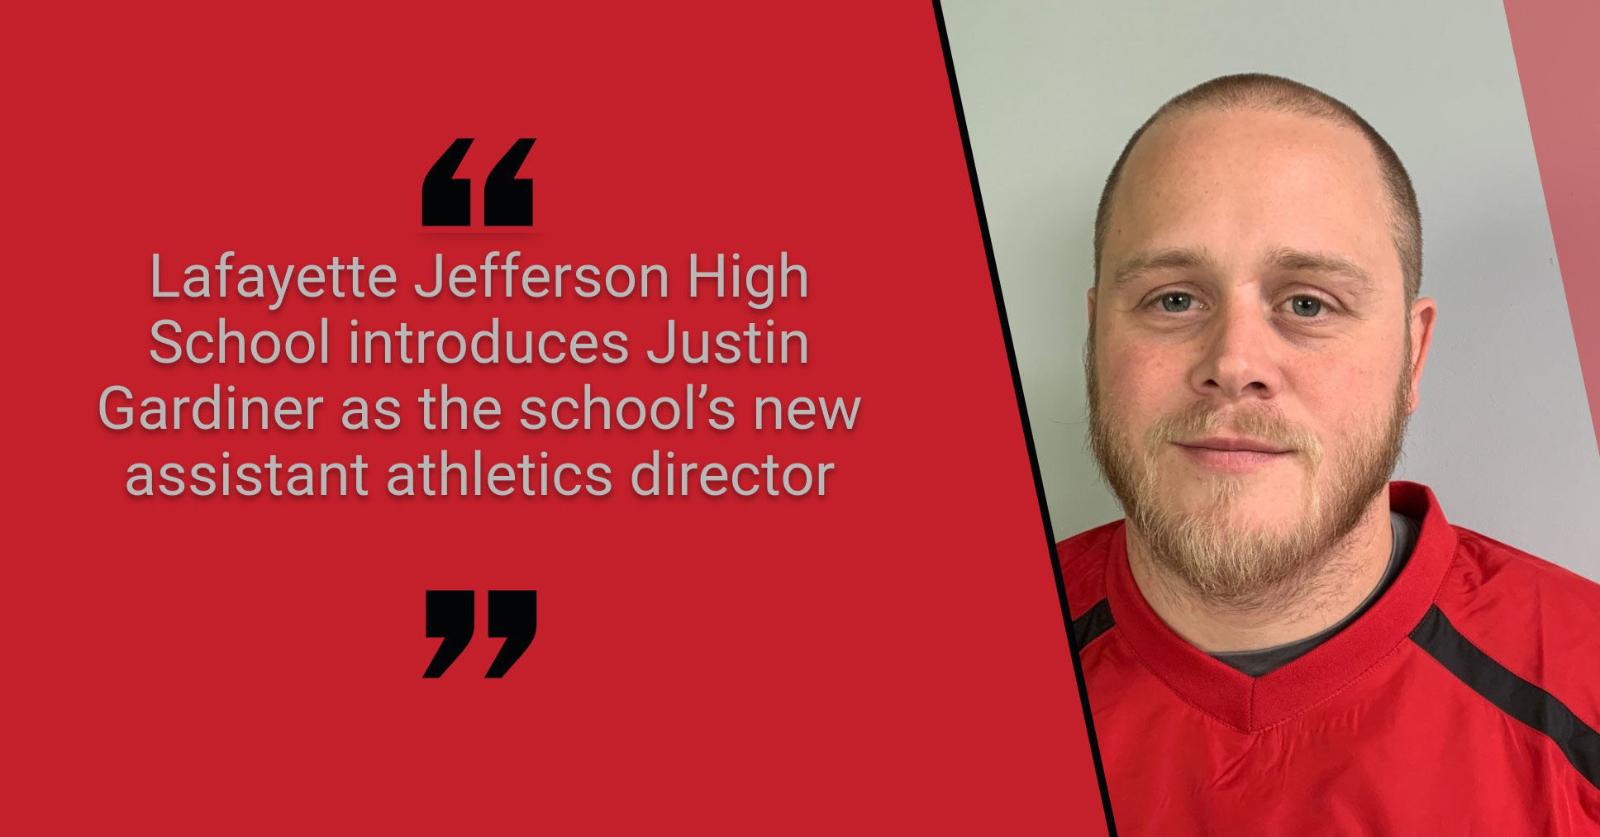 Justin Gardiner Named Assistant Athletics Director at Lafayette Jeff